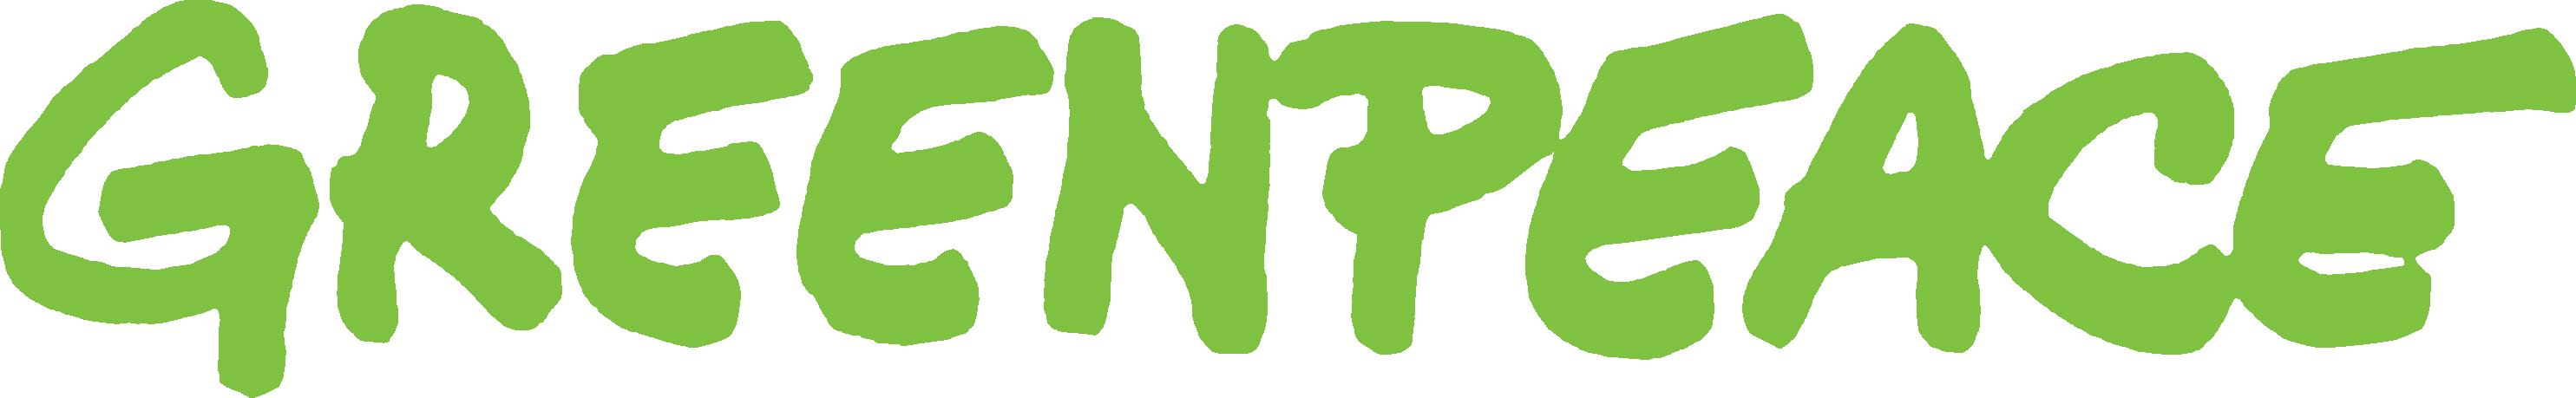 Greenpeace_logo-green